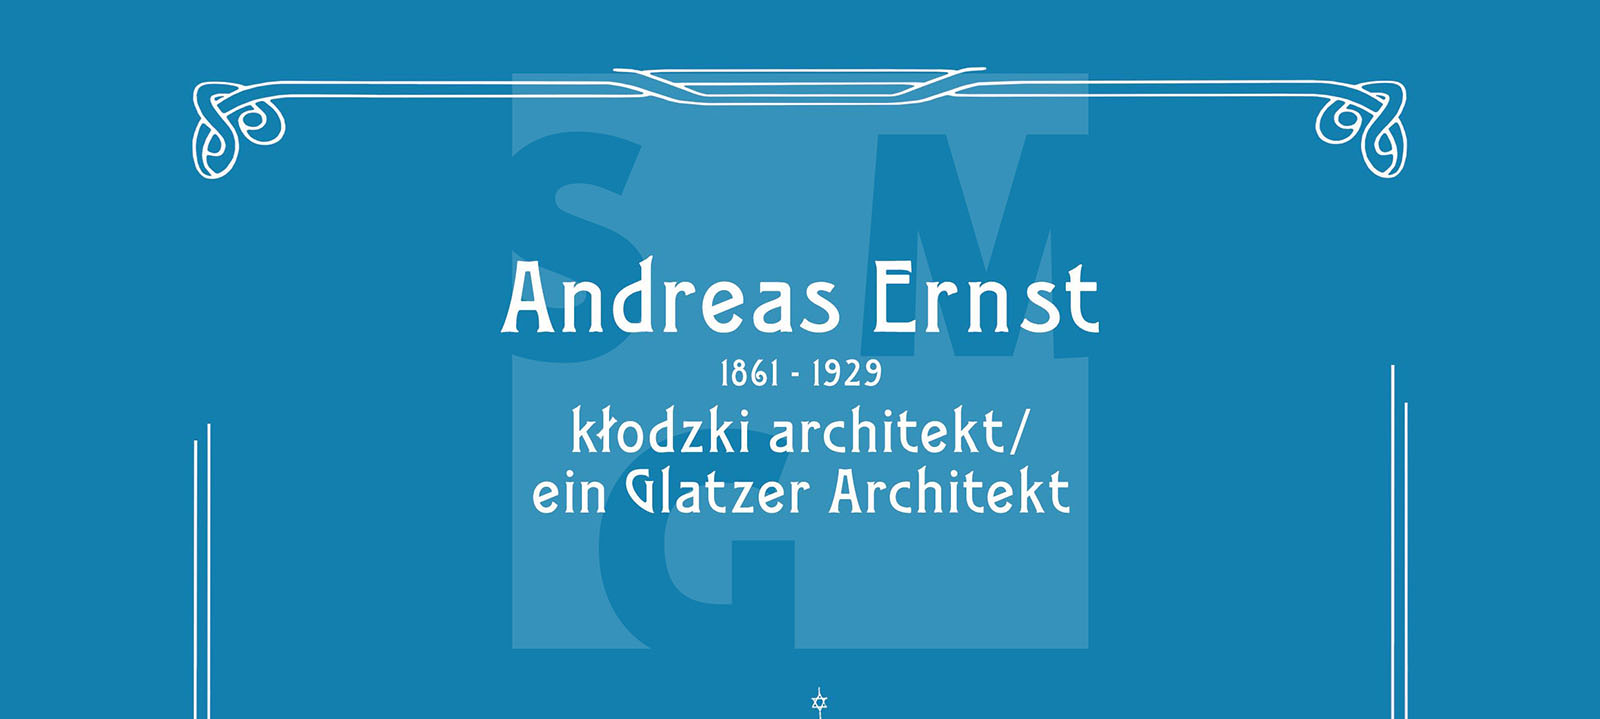 Hauptbild Andreas Ernst